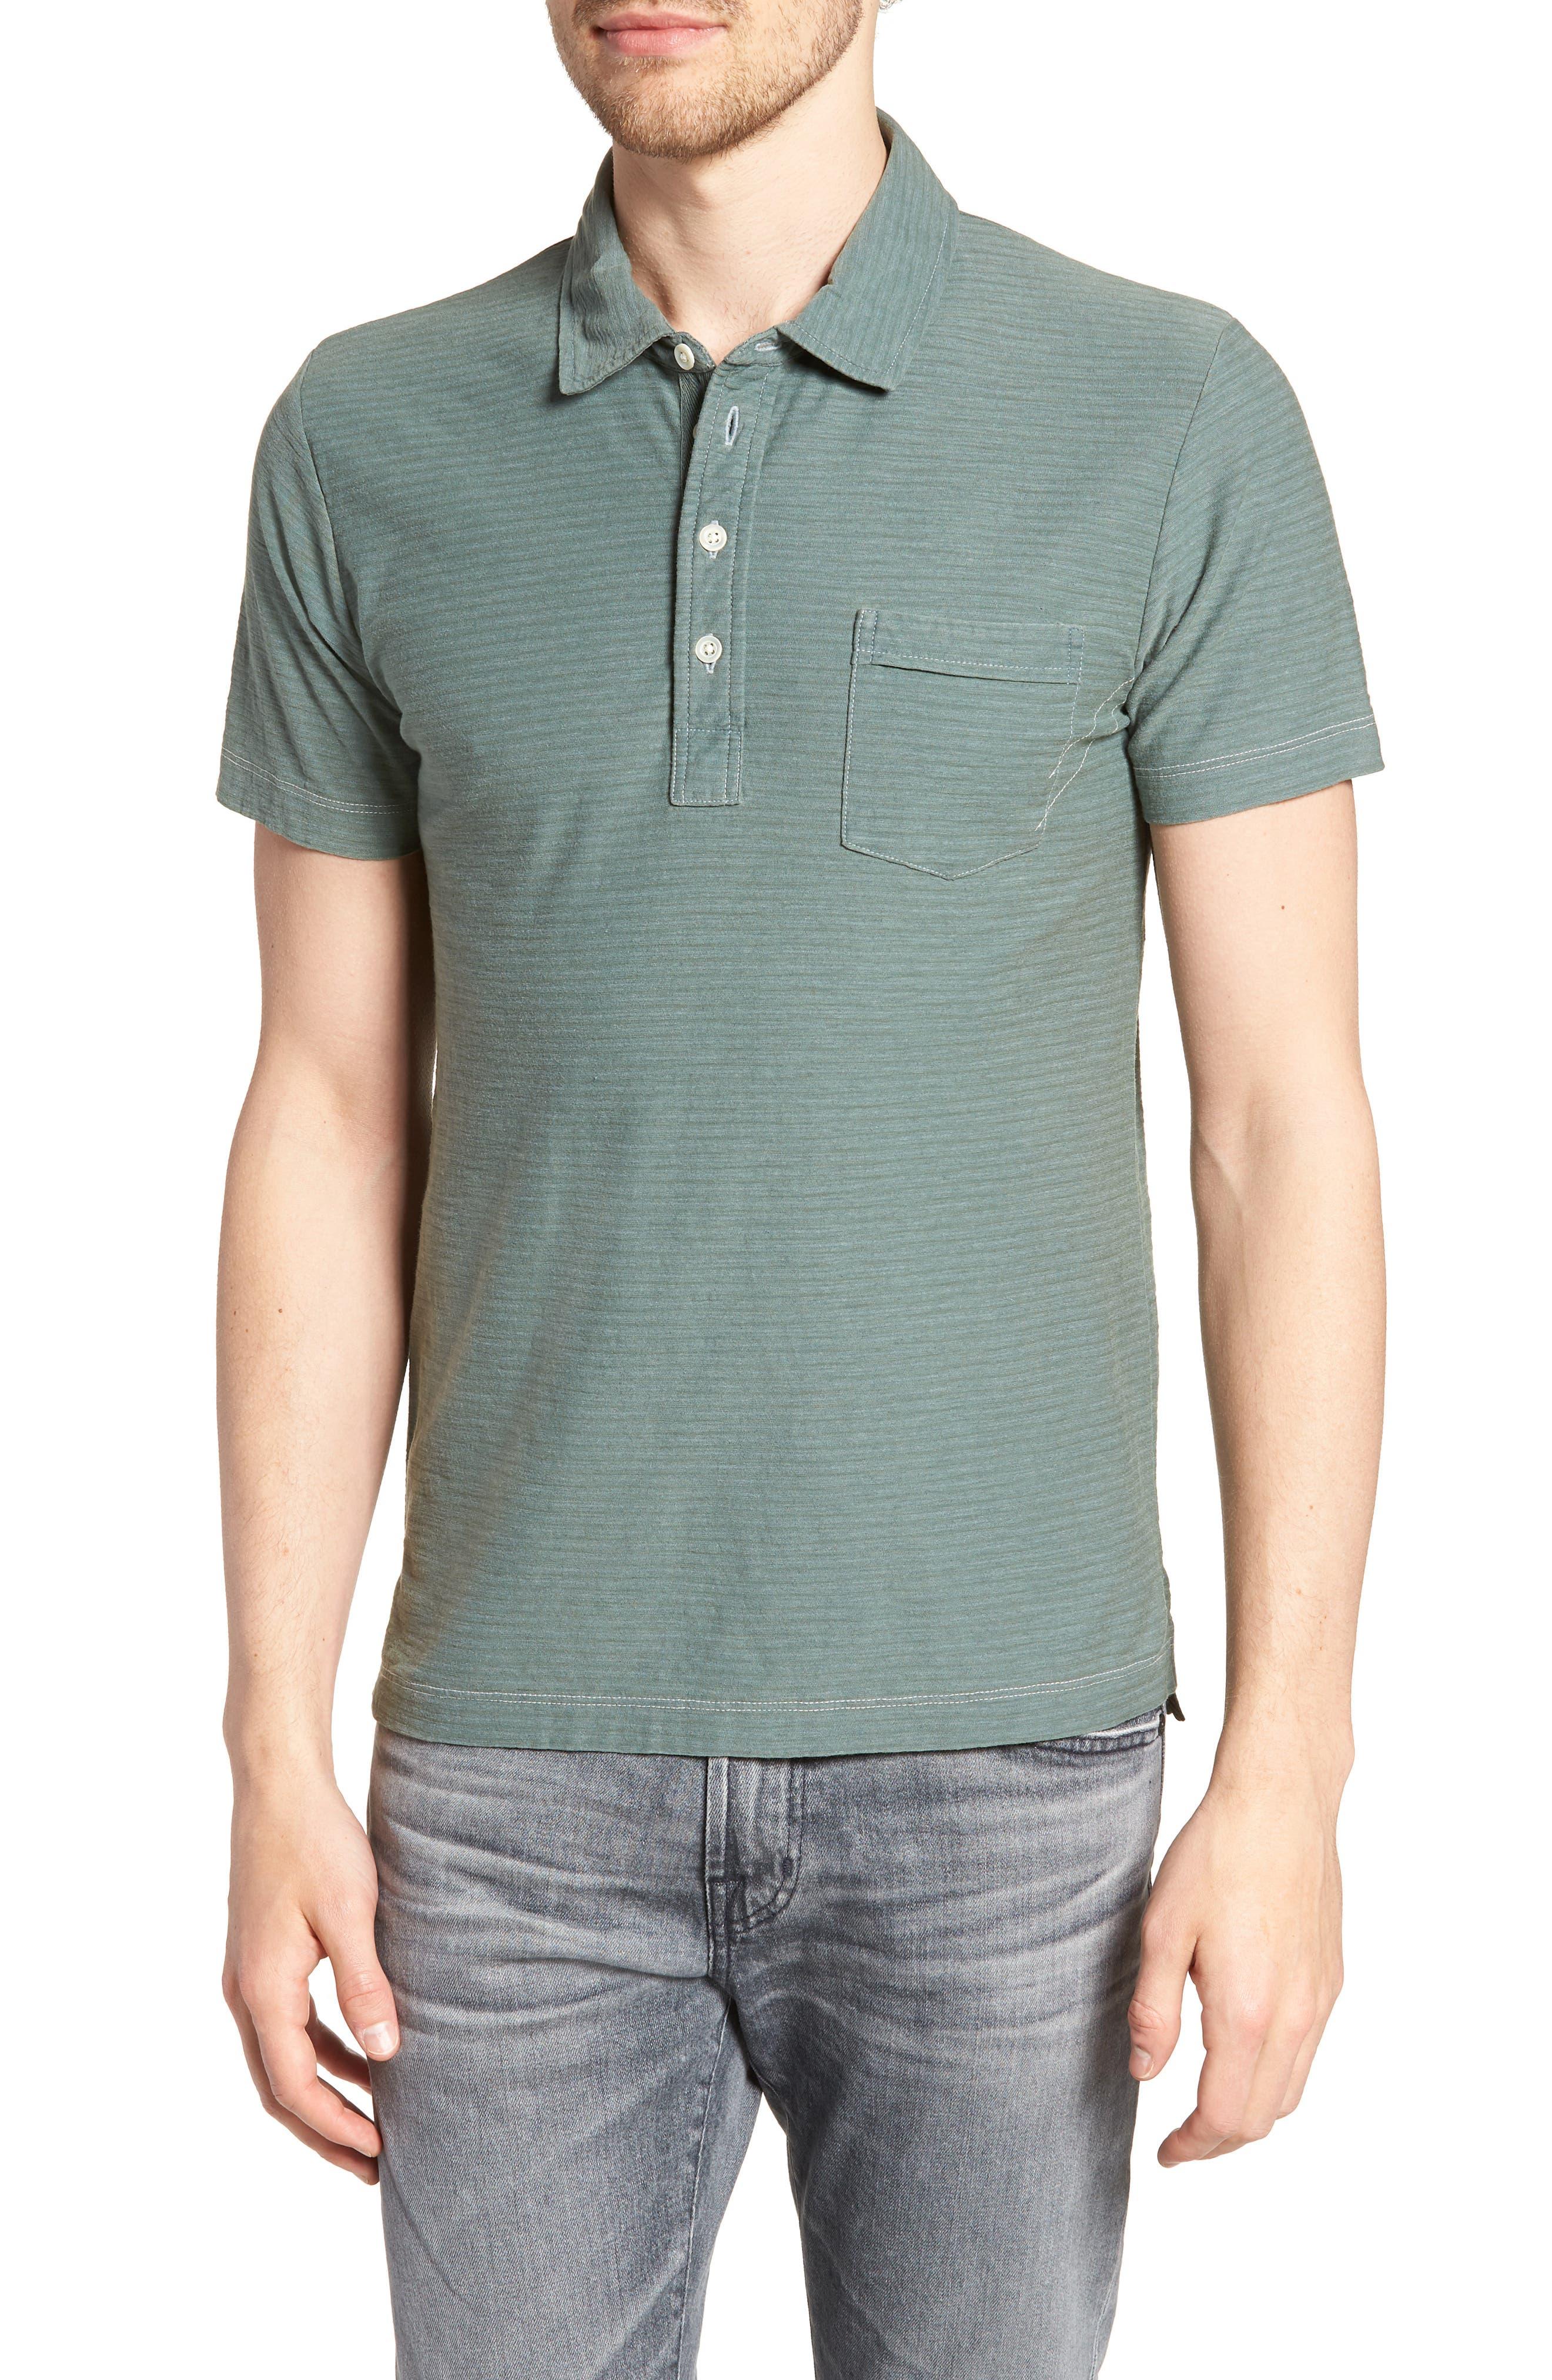 Pensacola Cotton Blend Polo Shirt,                         Main,                         color, SAGE